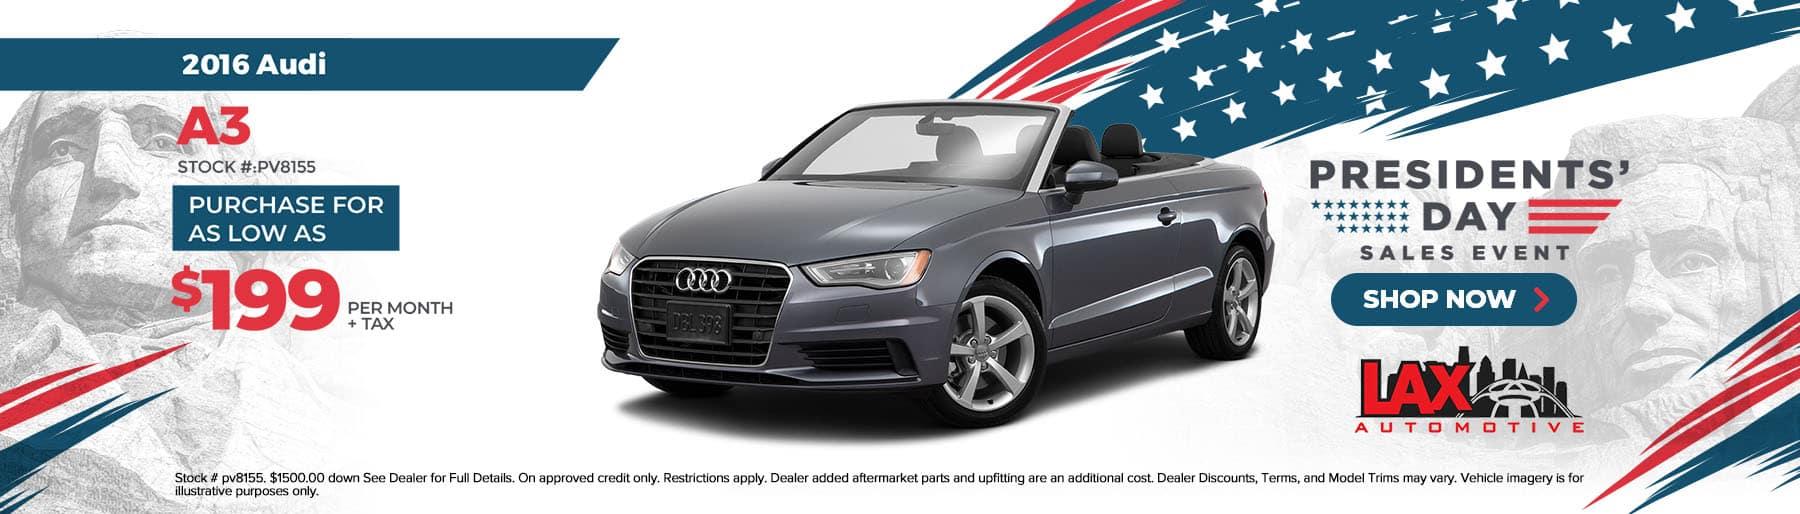 2021-02-Lax Automotive_Slide-1800×514 – 2016 Audi A3